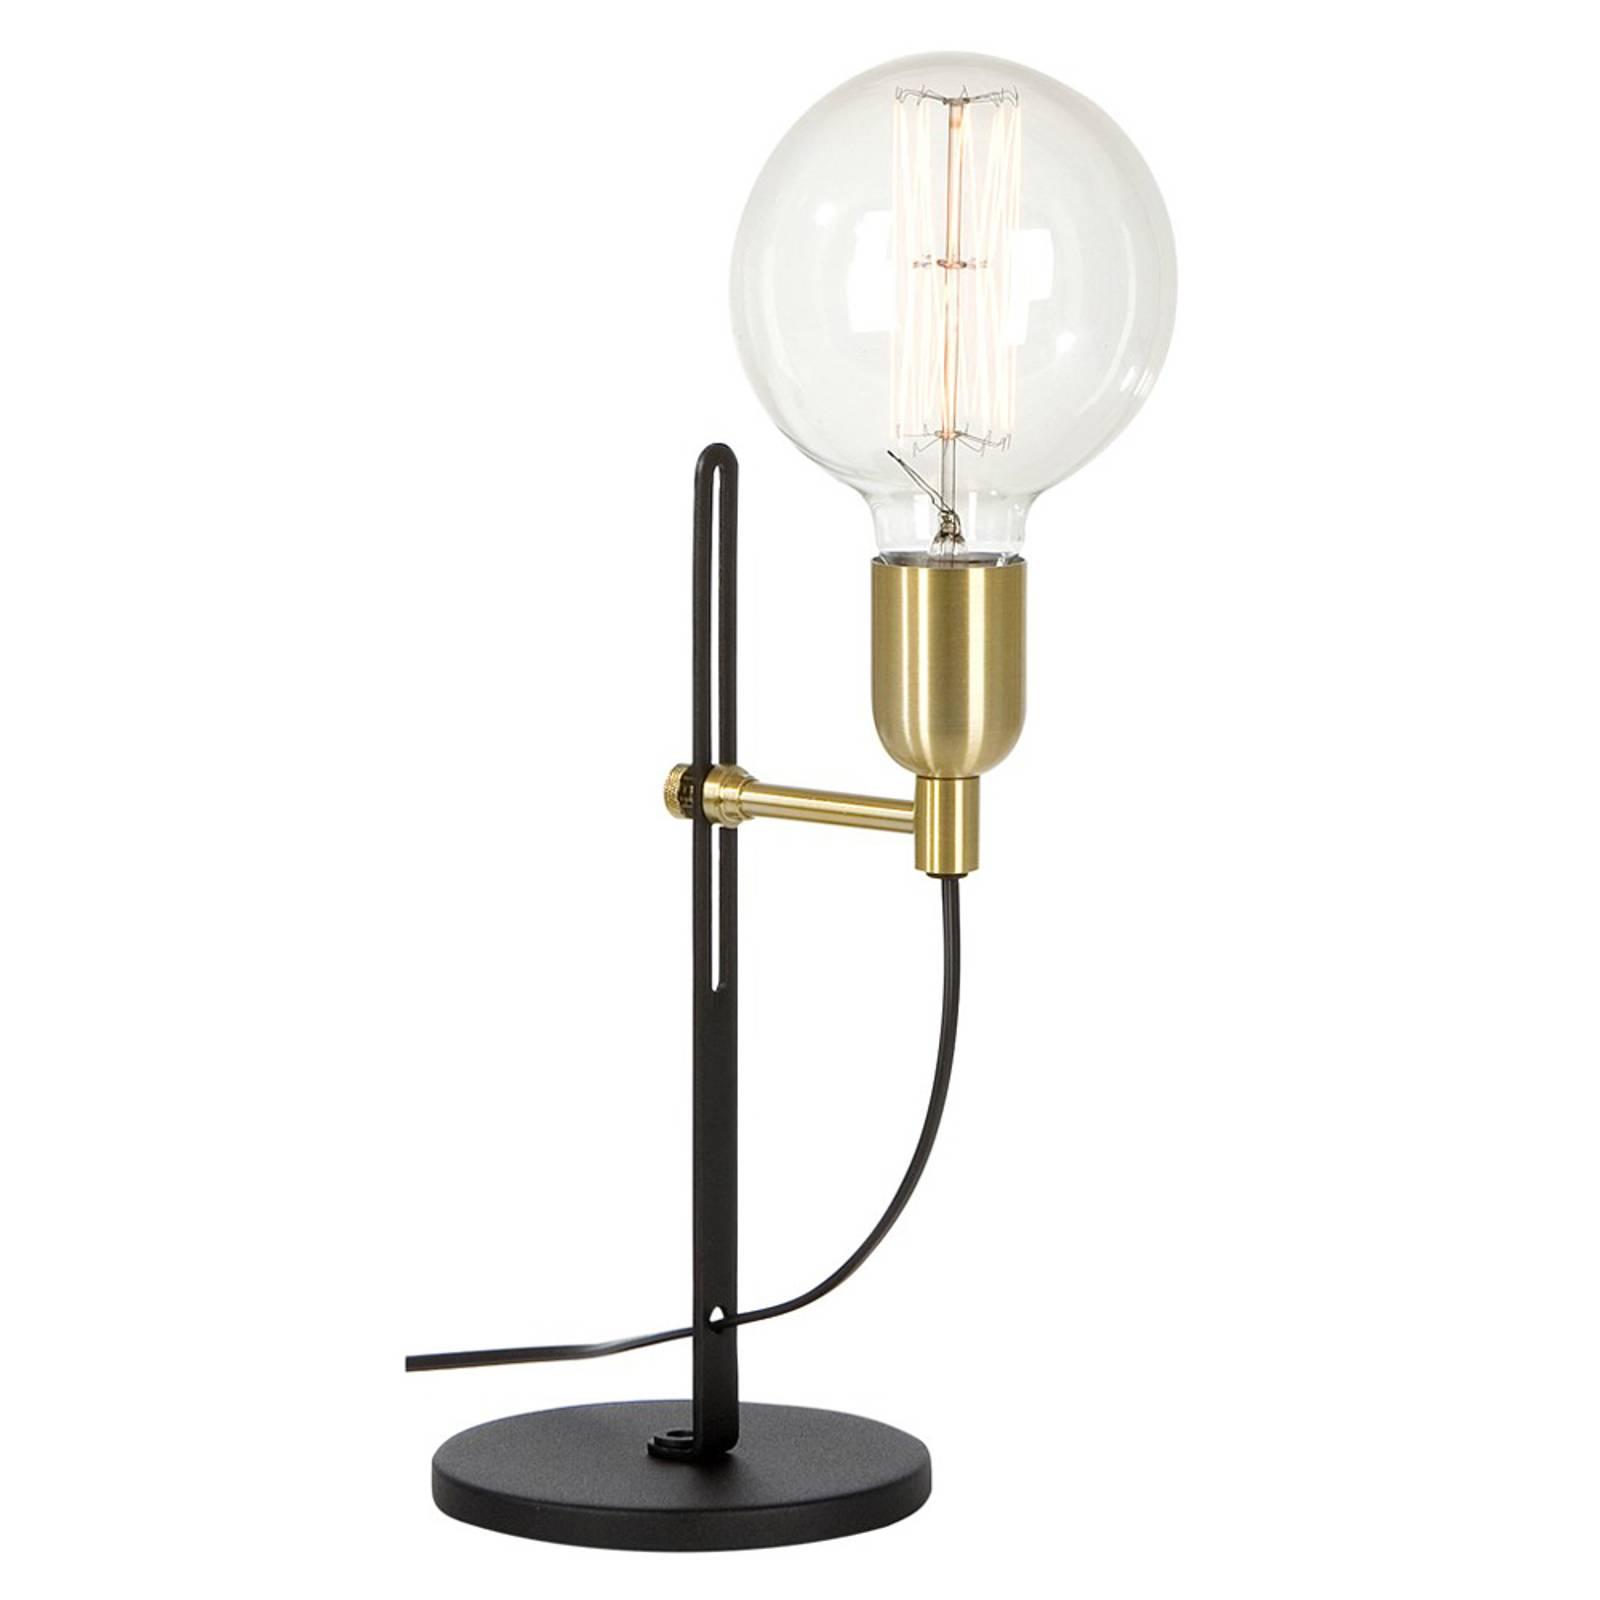 Tafellamp schap zwart/messing 1-lamp